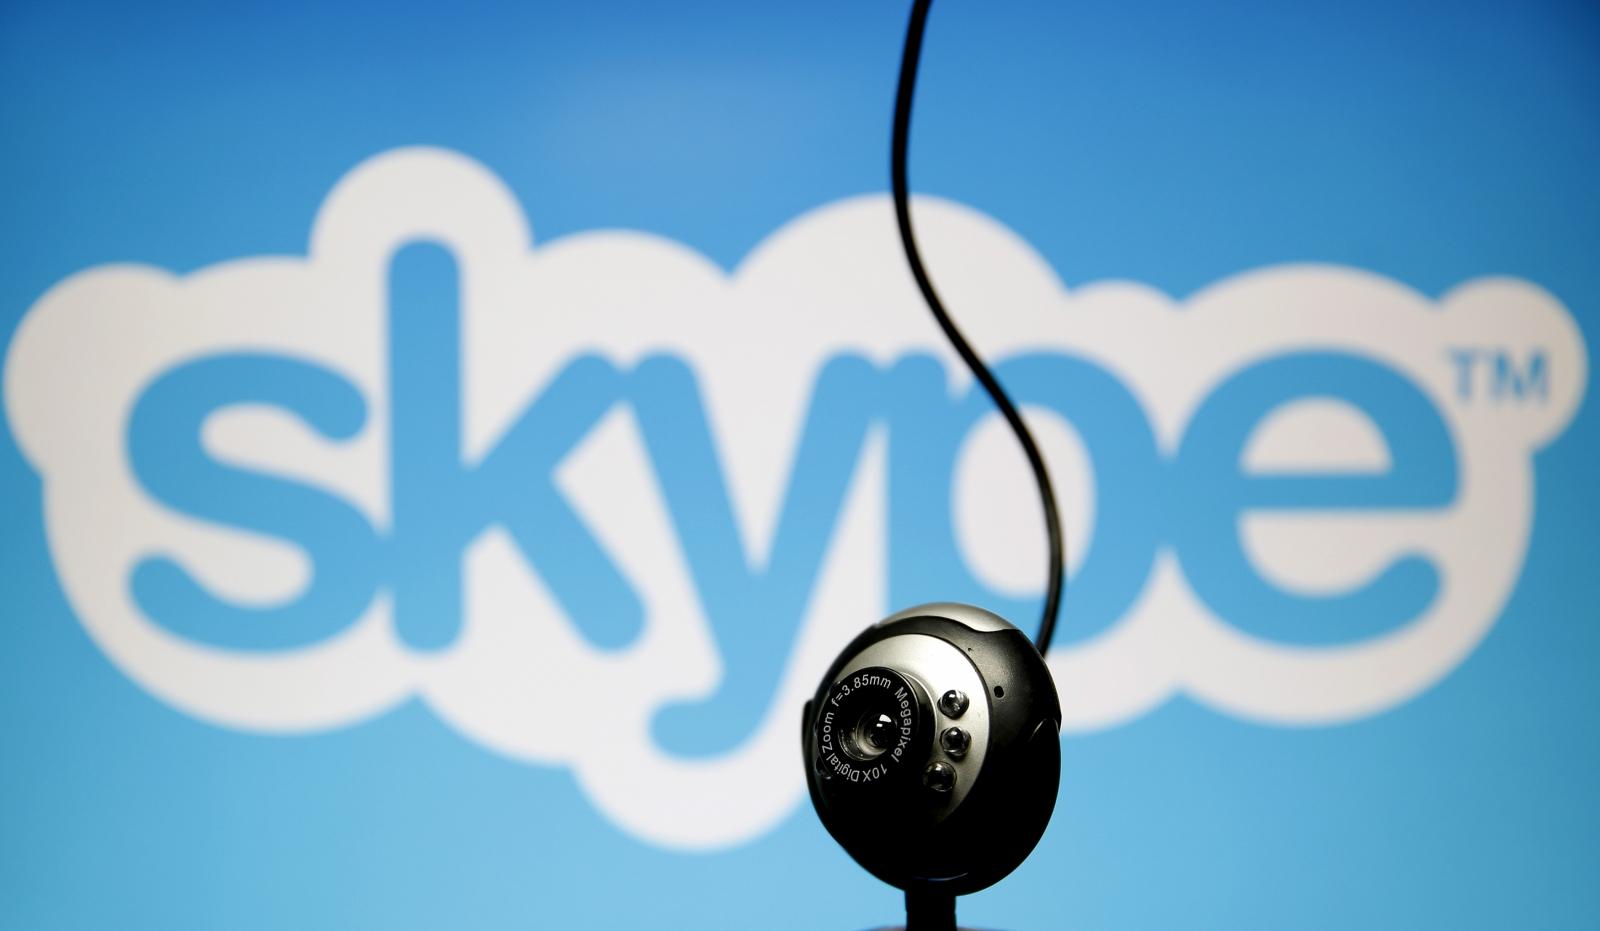 Skype messaging app